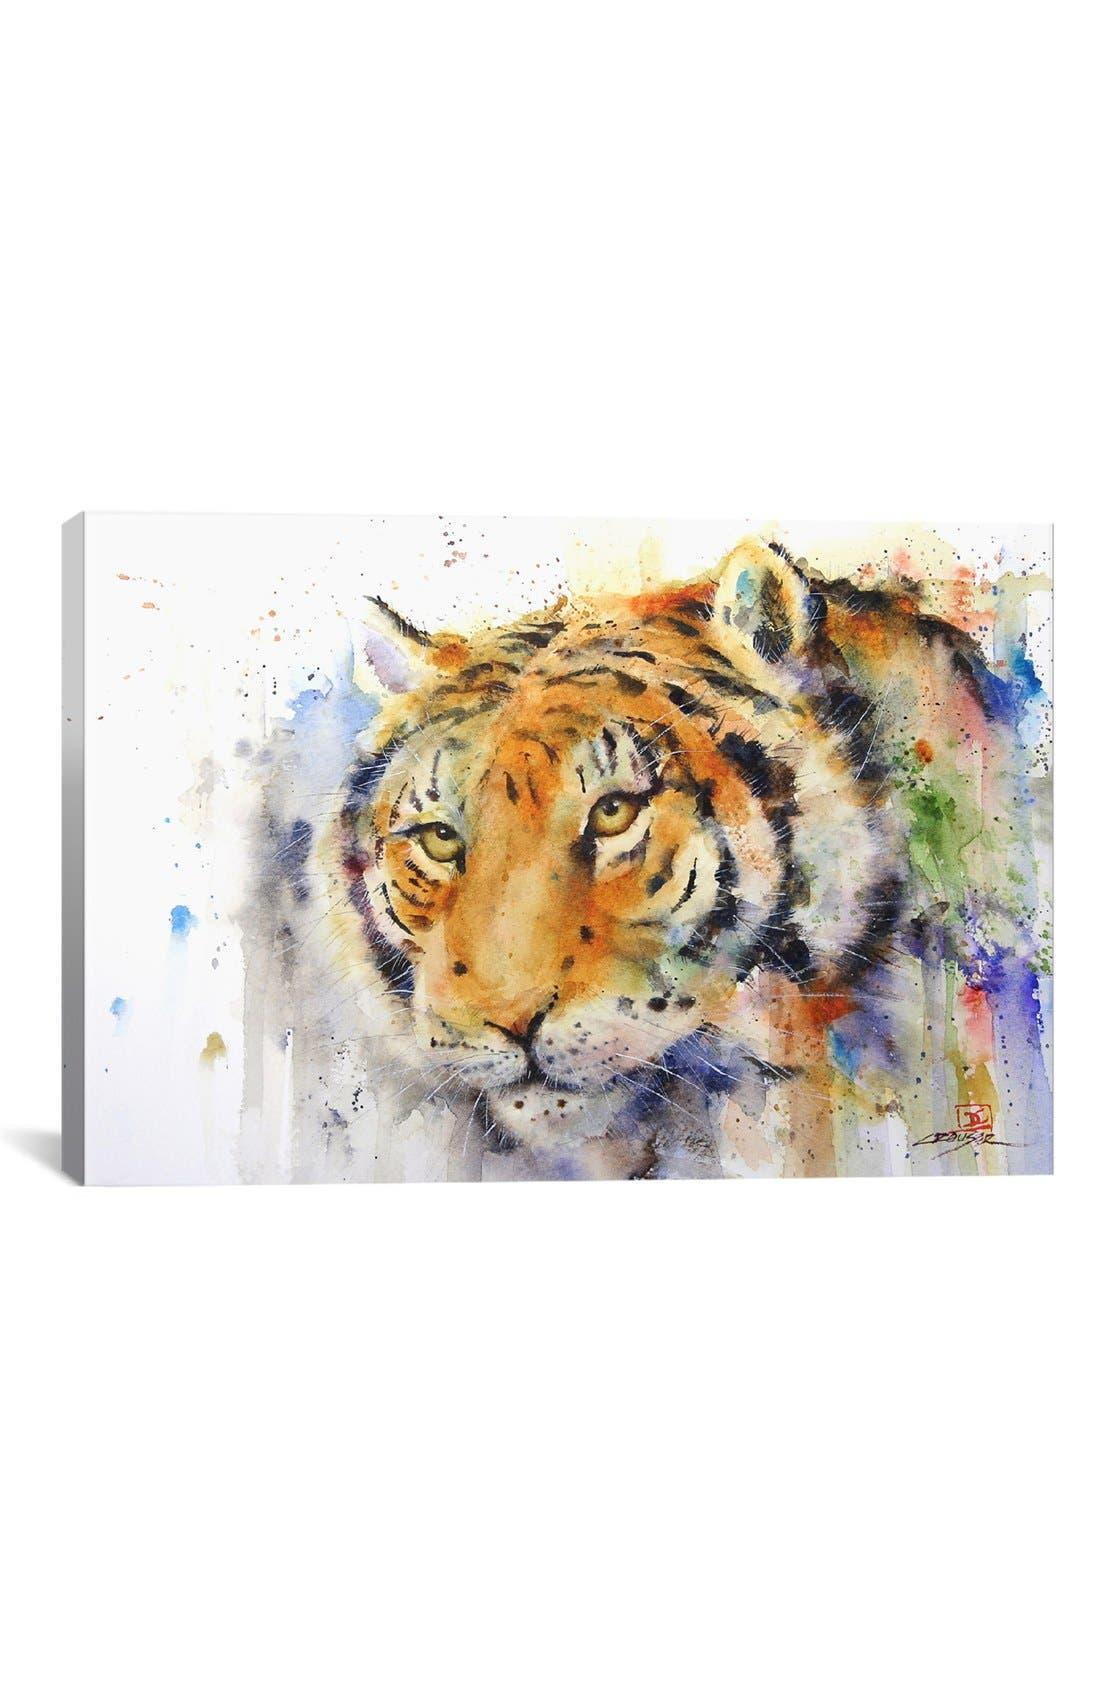 Alternate Image 1 Selected - iCanvas 'Tiger - Dean Crouser' Giclée Print Canvas Art